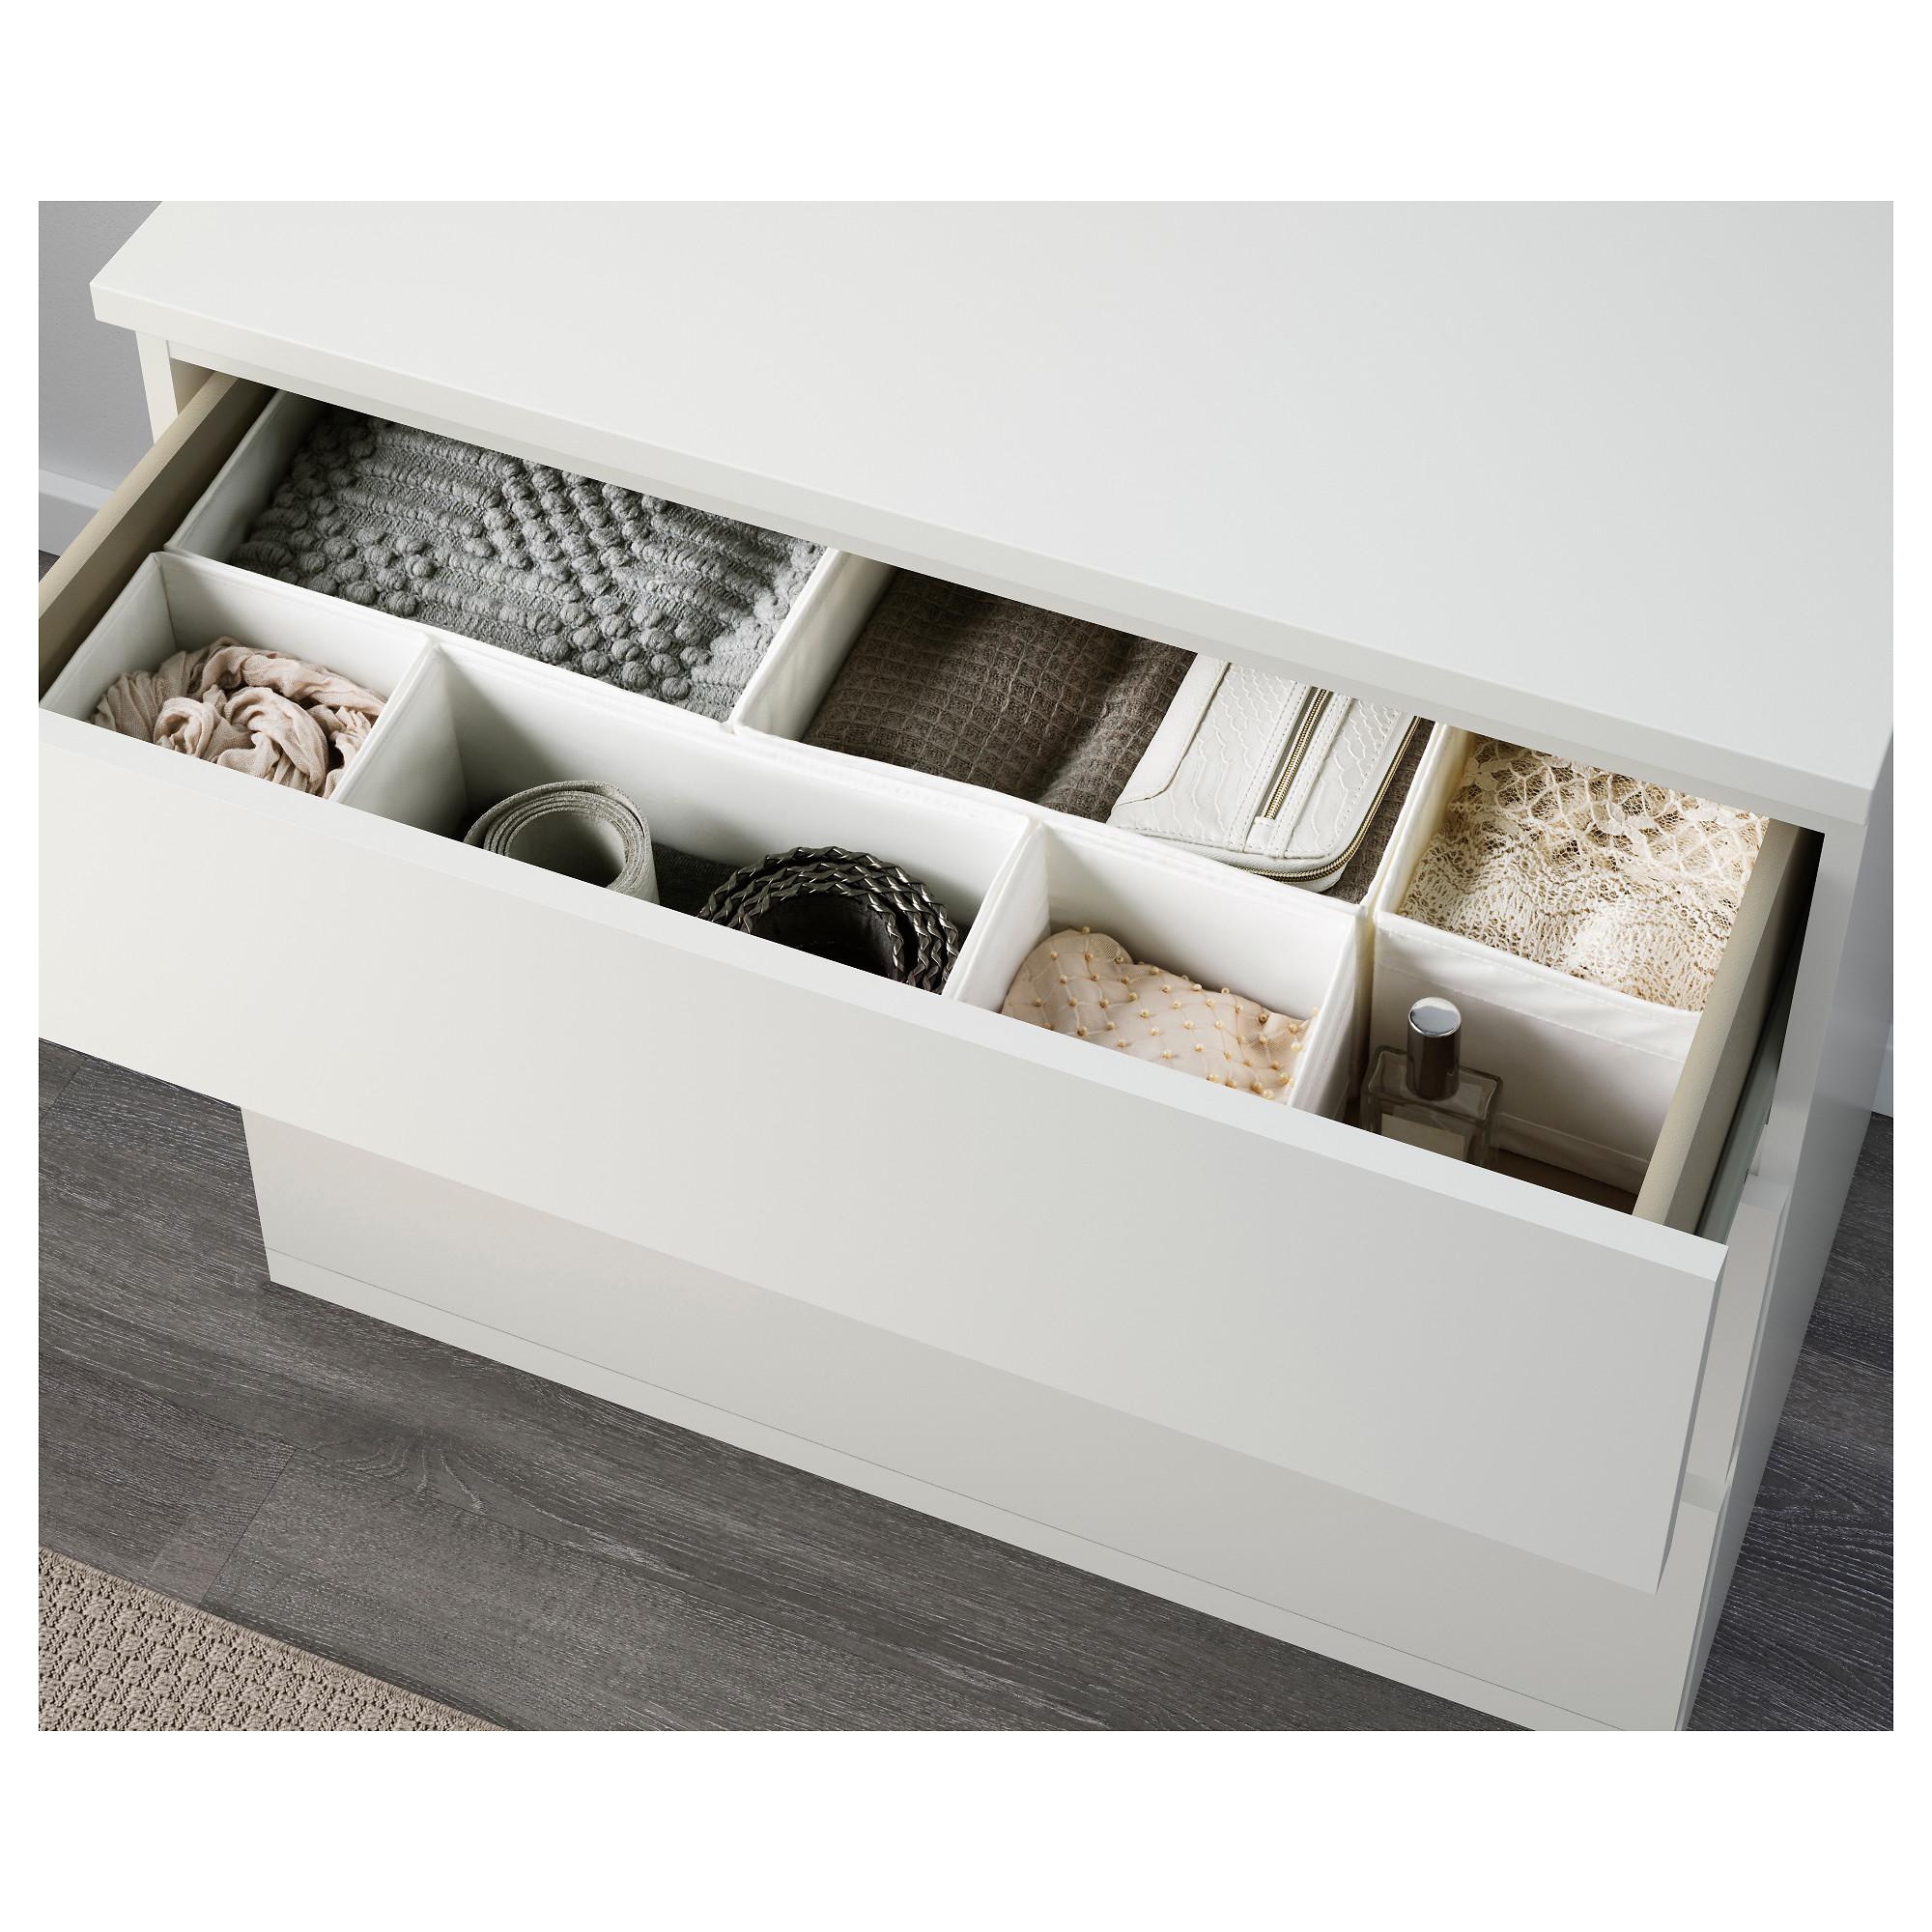 Ikea Kullen Garderobekast.Ikea Latvia Shop For Furniture Lighting Home Accessories